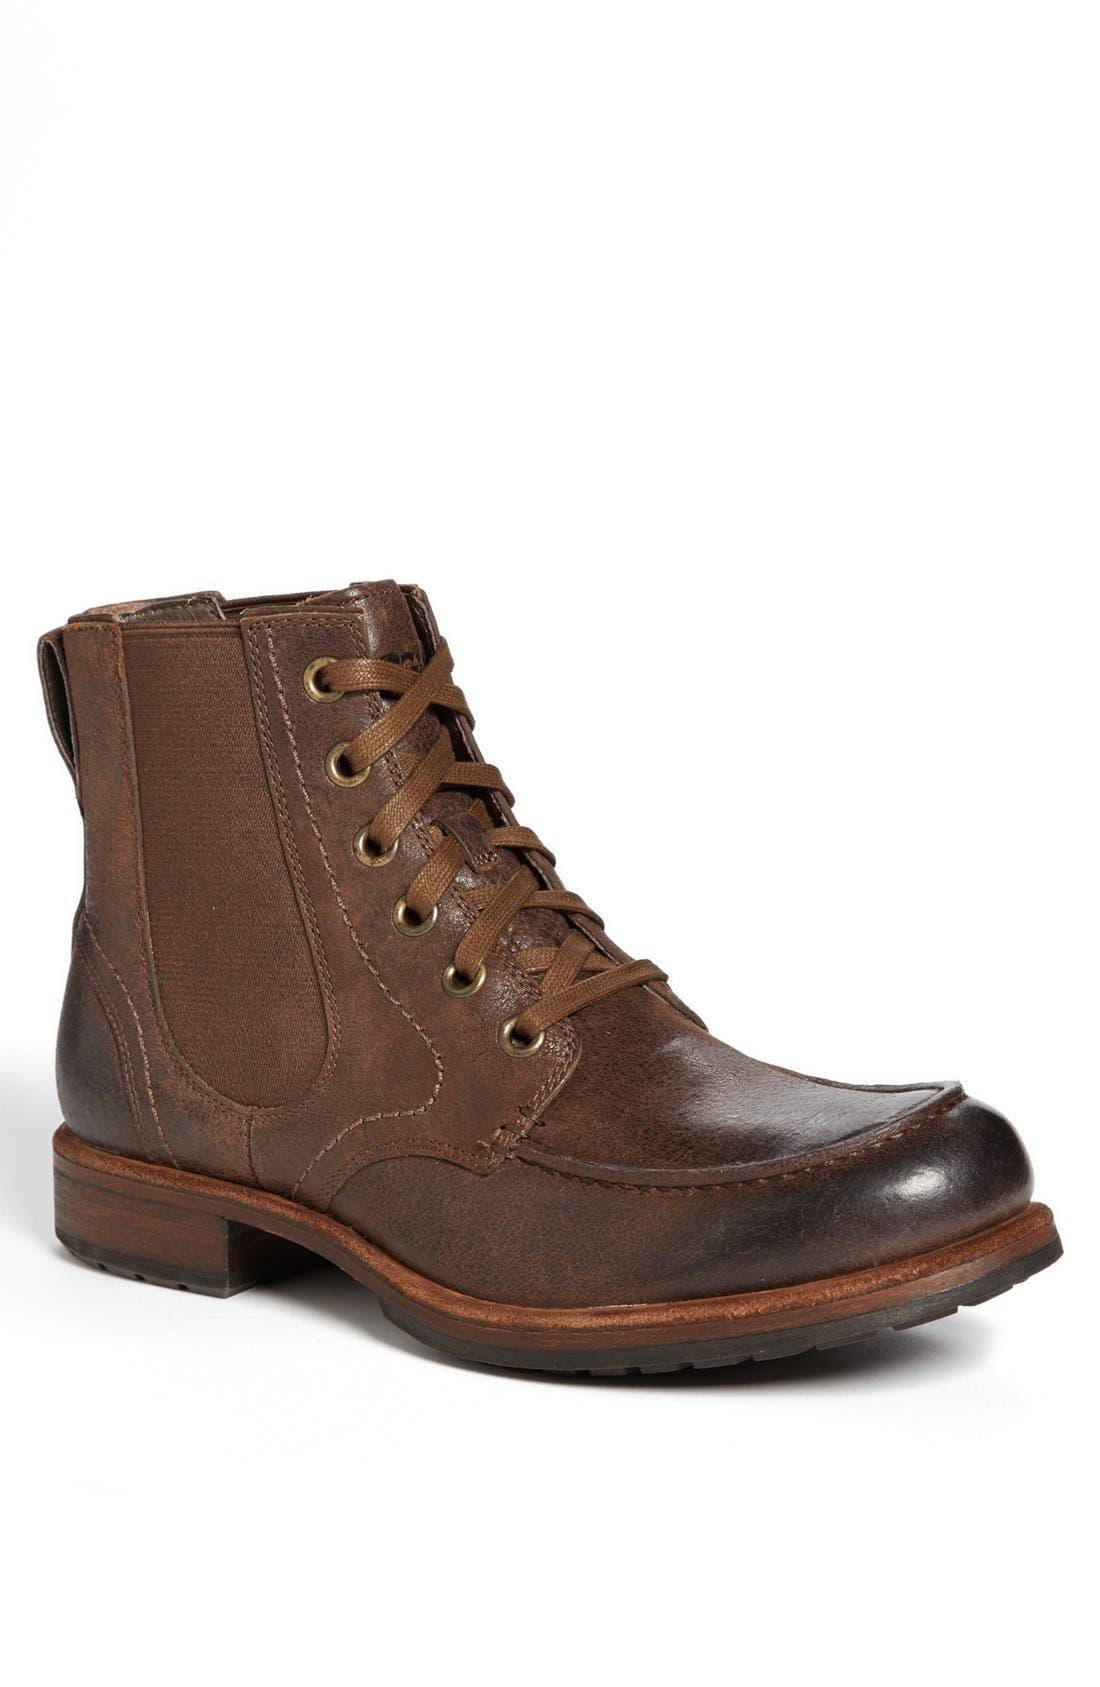 Main Image - UGG® Australia 'Jarrett' Moc Toe Boot (Men)